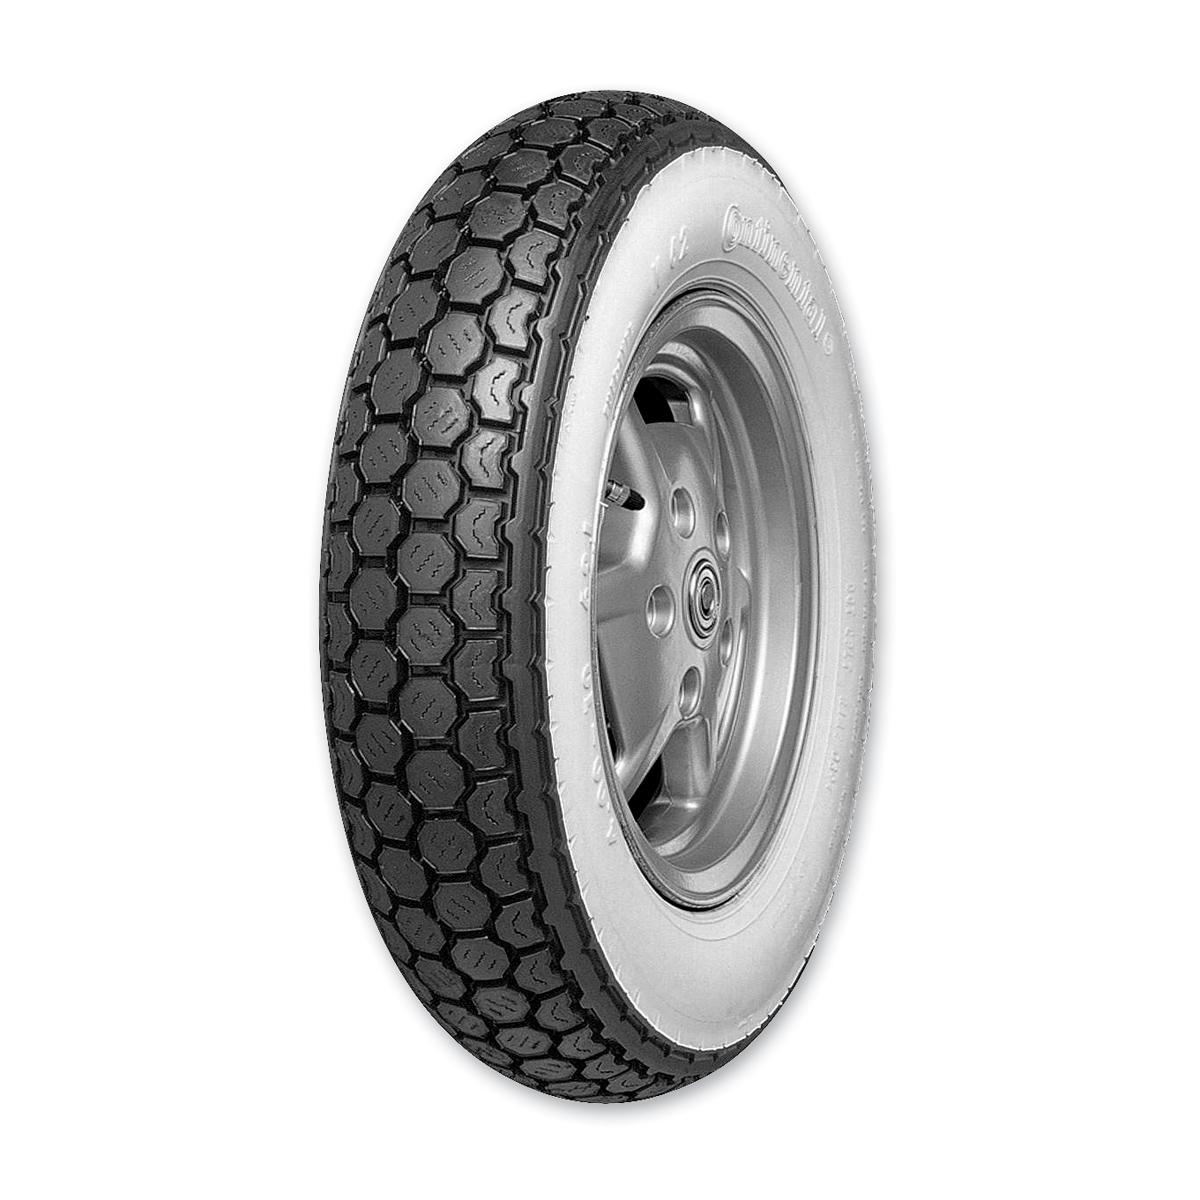 Continental K62 3.50-10 WWW Front/Rear Tire